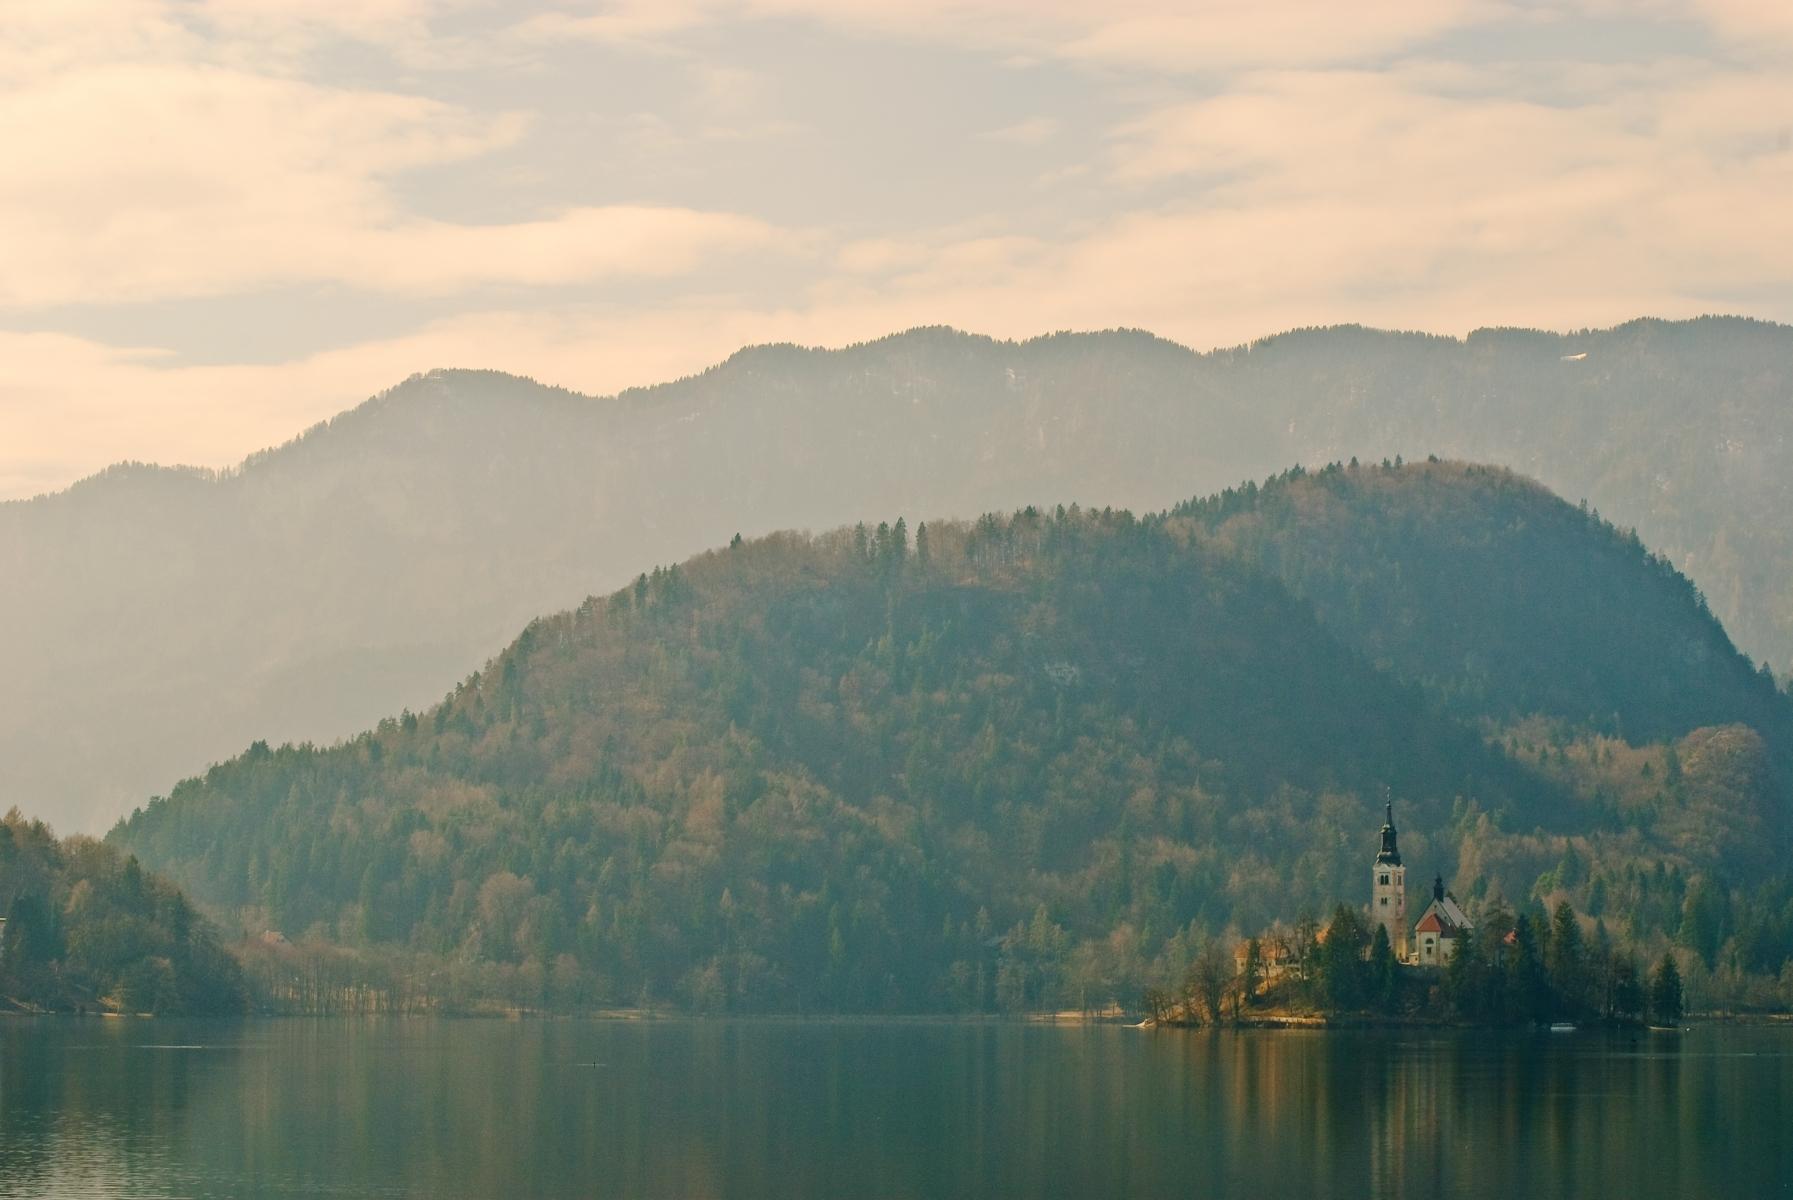 Bled lake and island, Slovenia